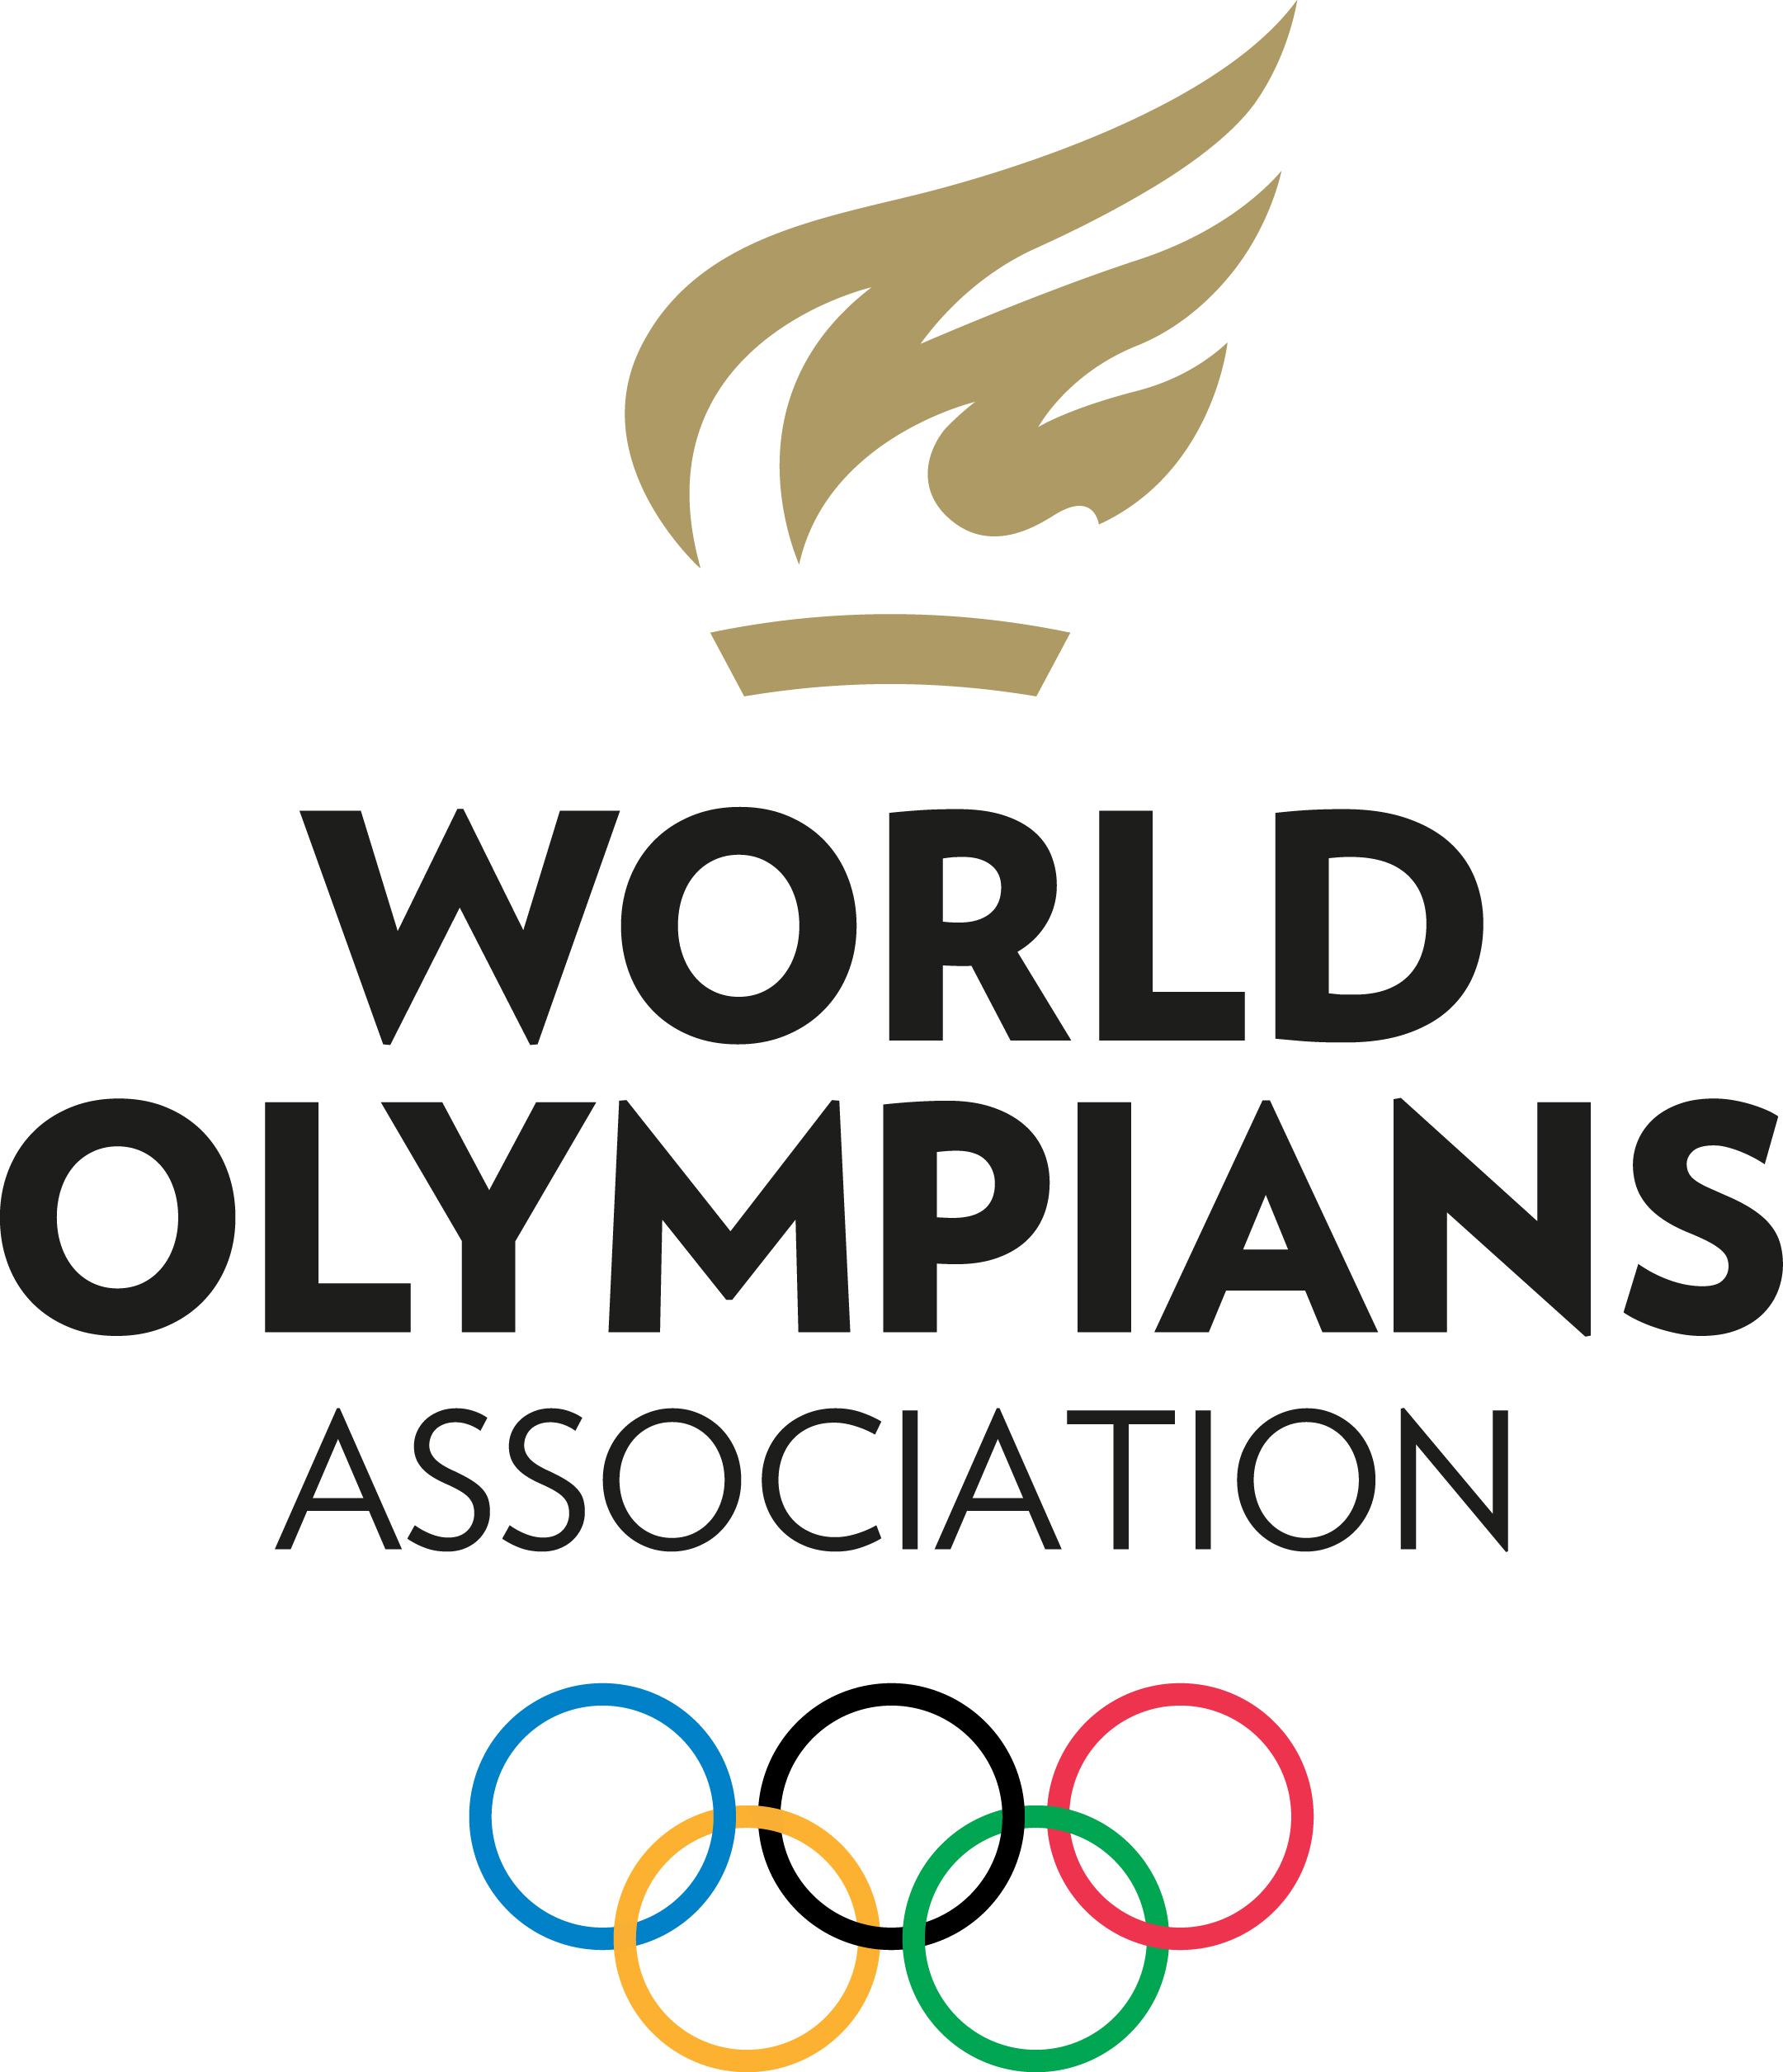 World Olympians Association